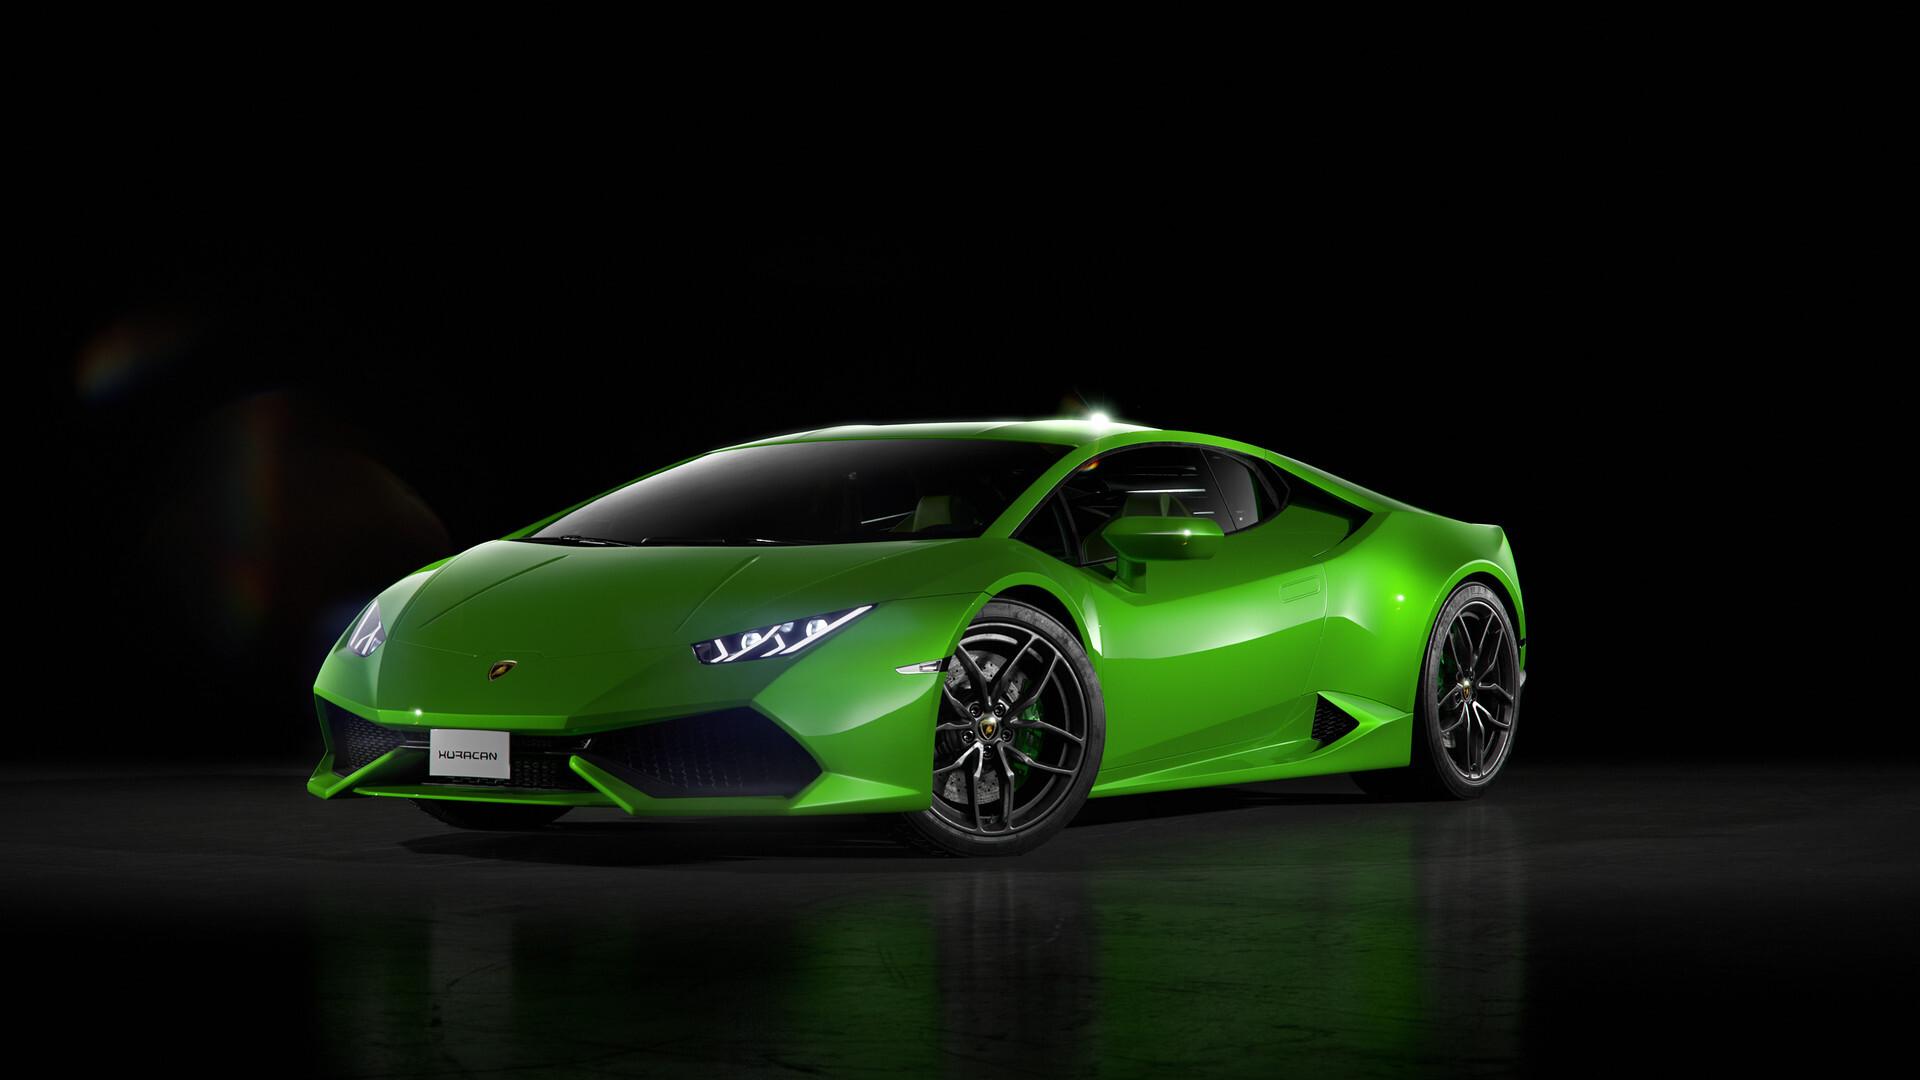 1920x1080 Green Lamborghini Huracan Front Laptop Full HD ...